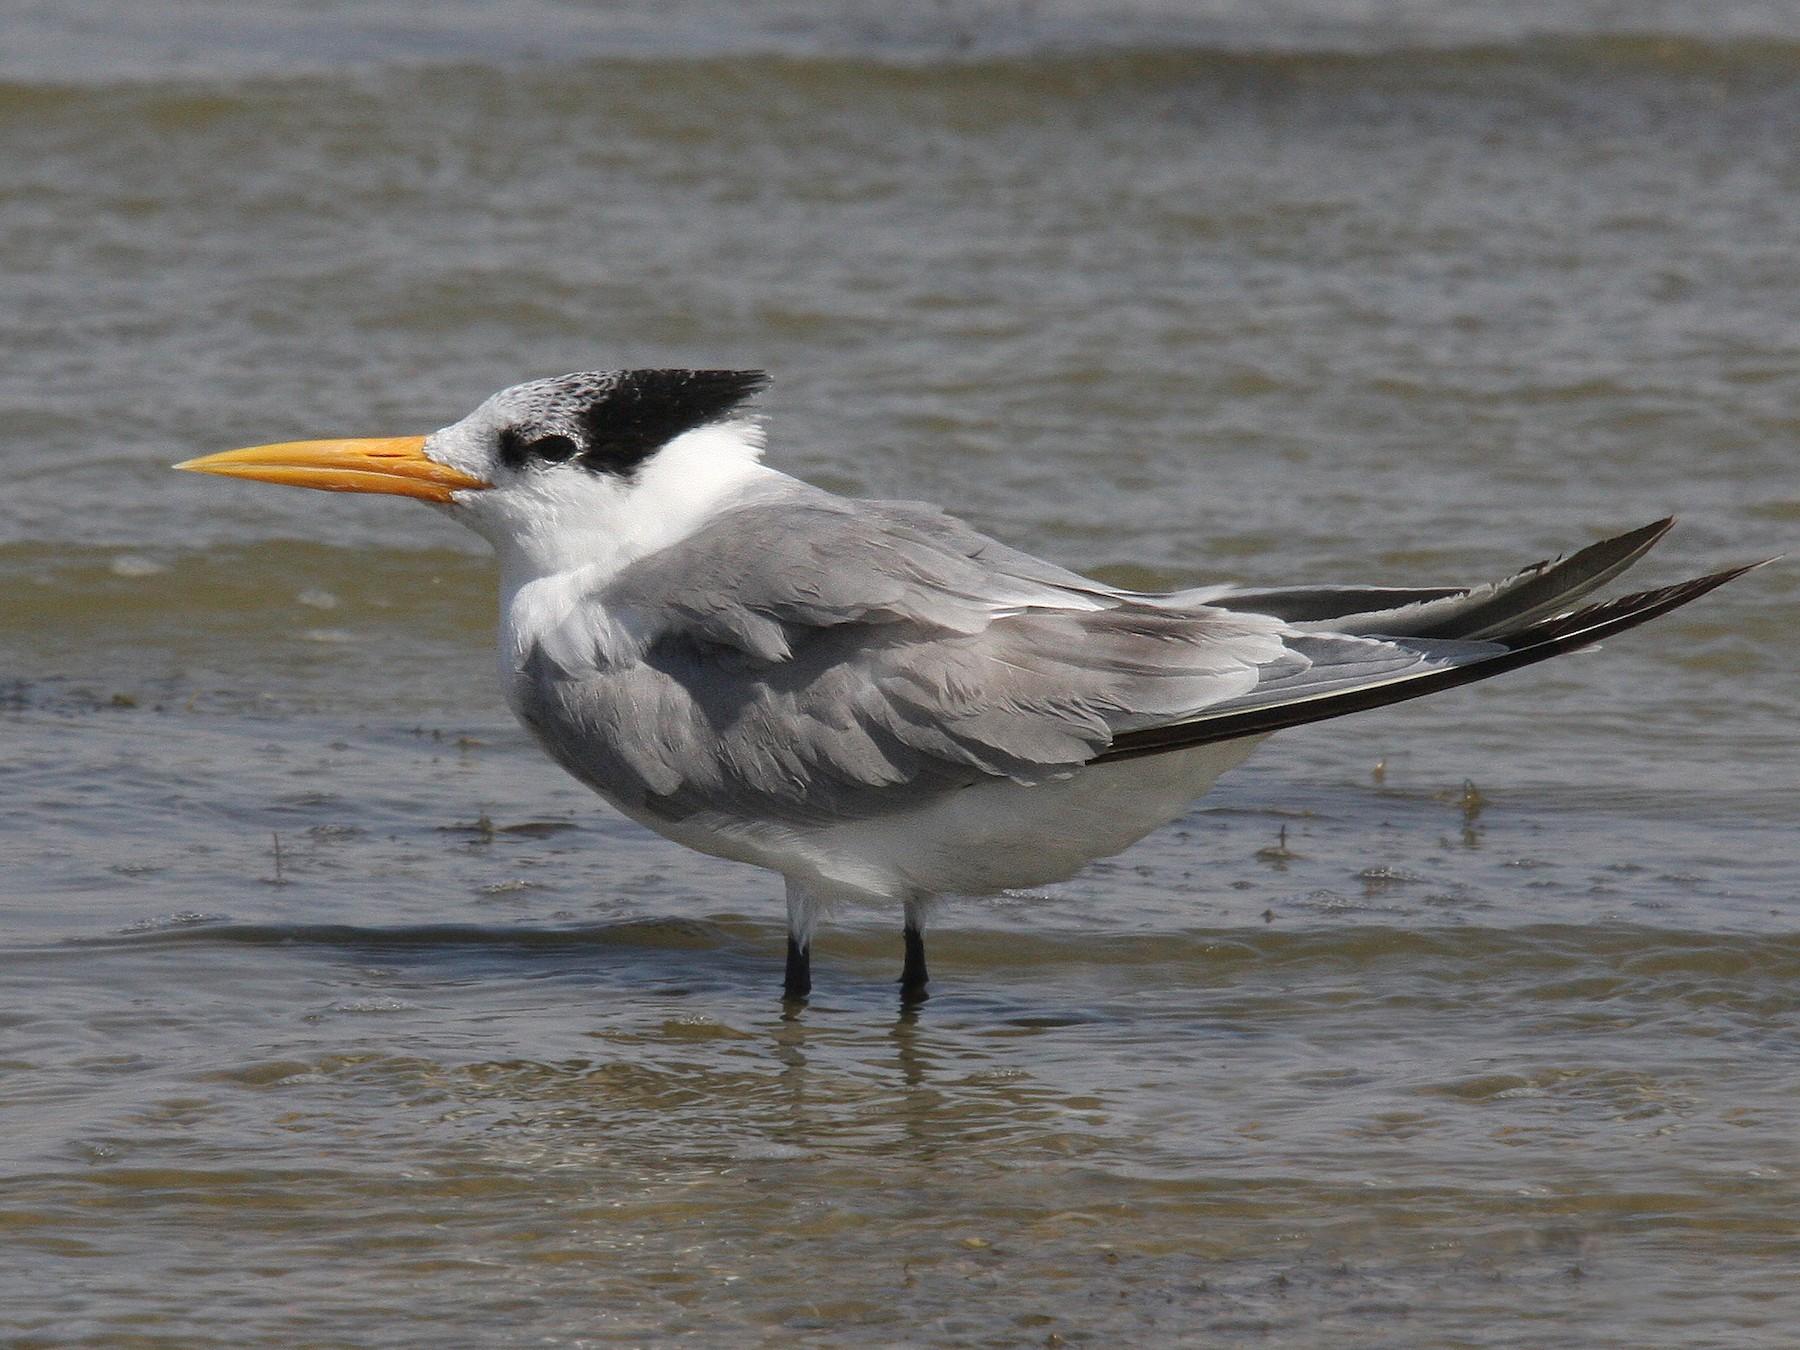 Lesser Crested Tern - Christoph Moning